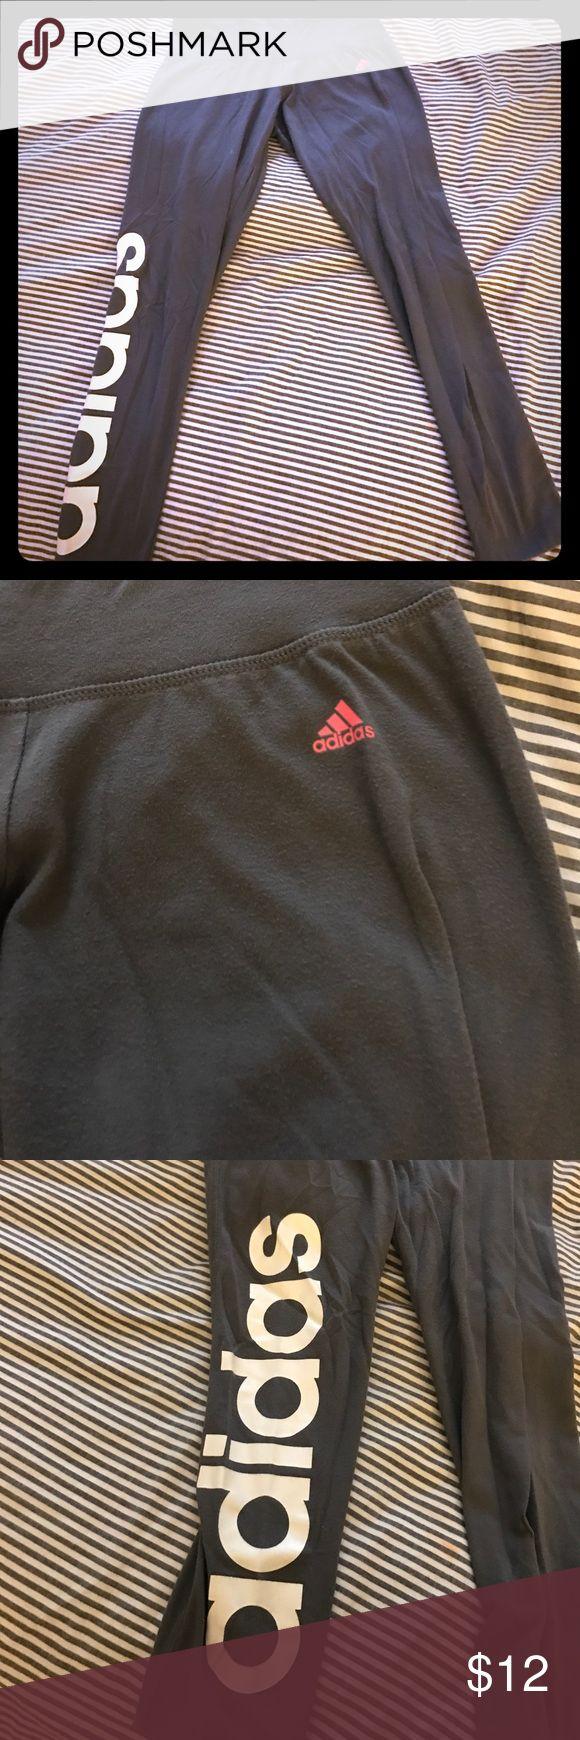 Adidas Leggings Cute Gray Adidas Cotton Leggings, comfortable, great condition, size small Adidas Pants Leggings